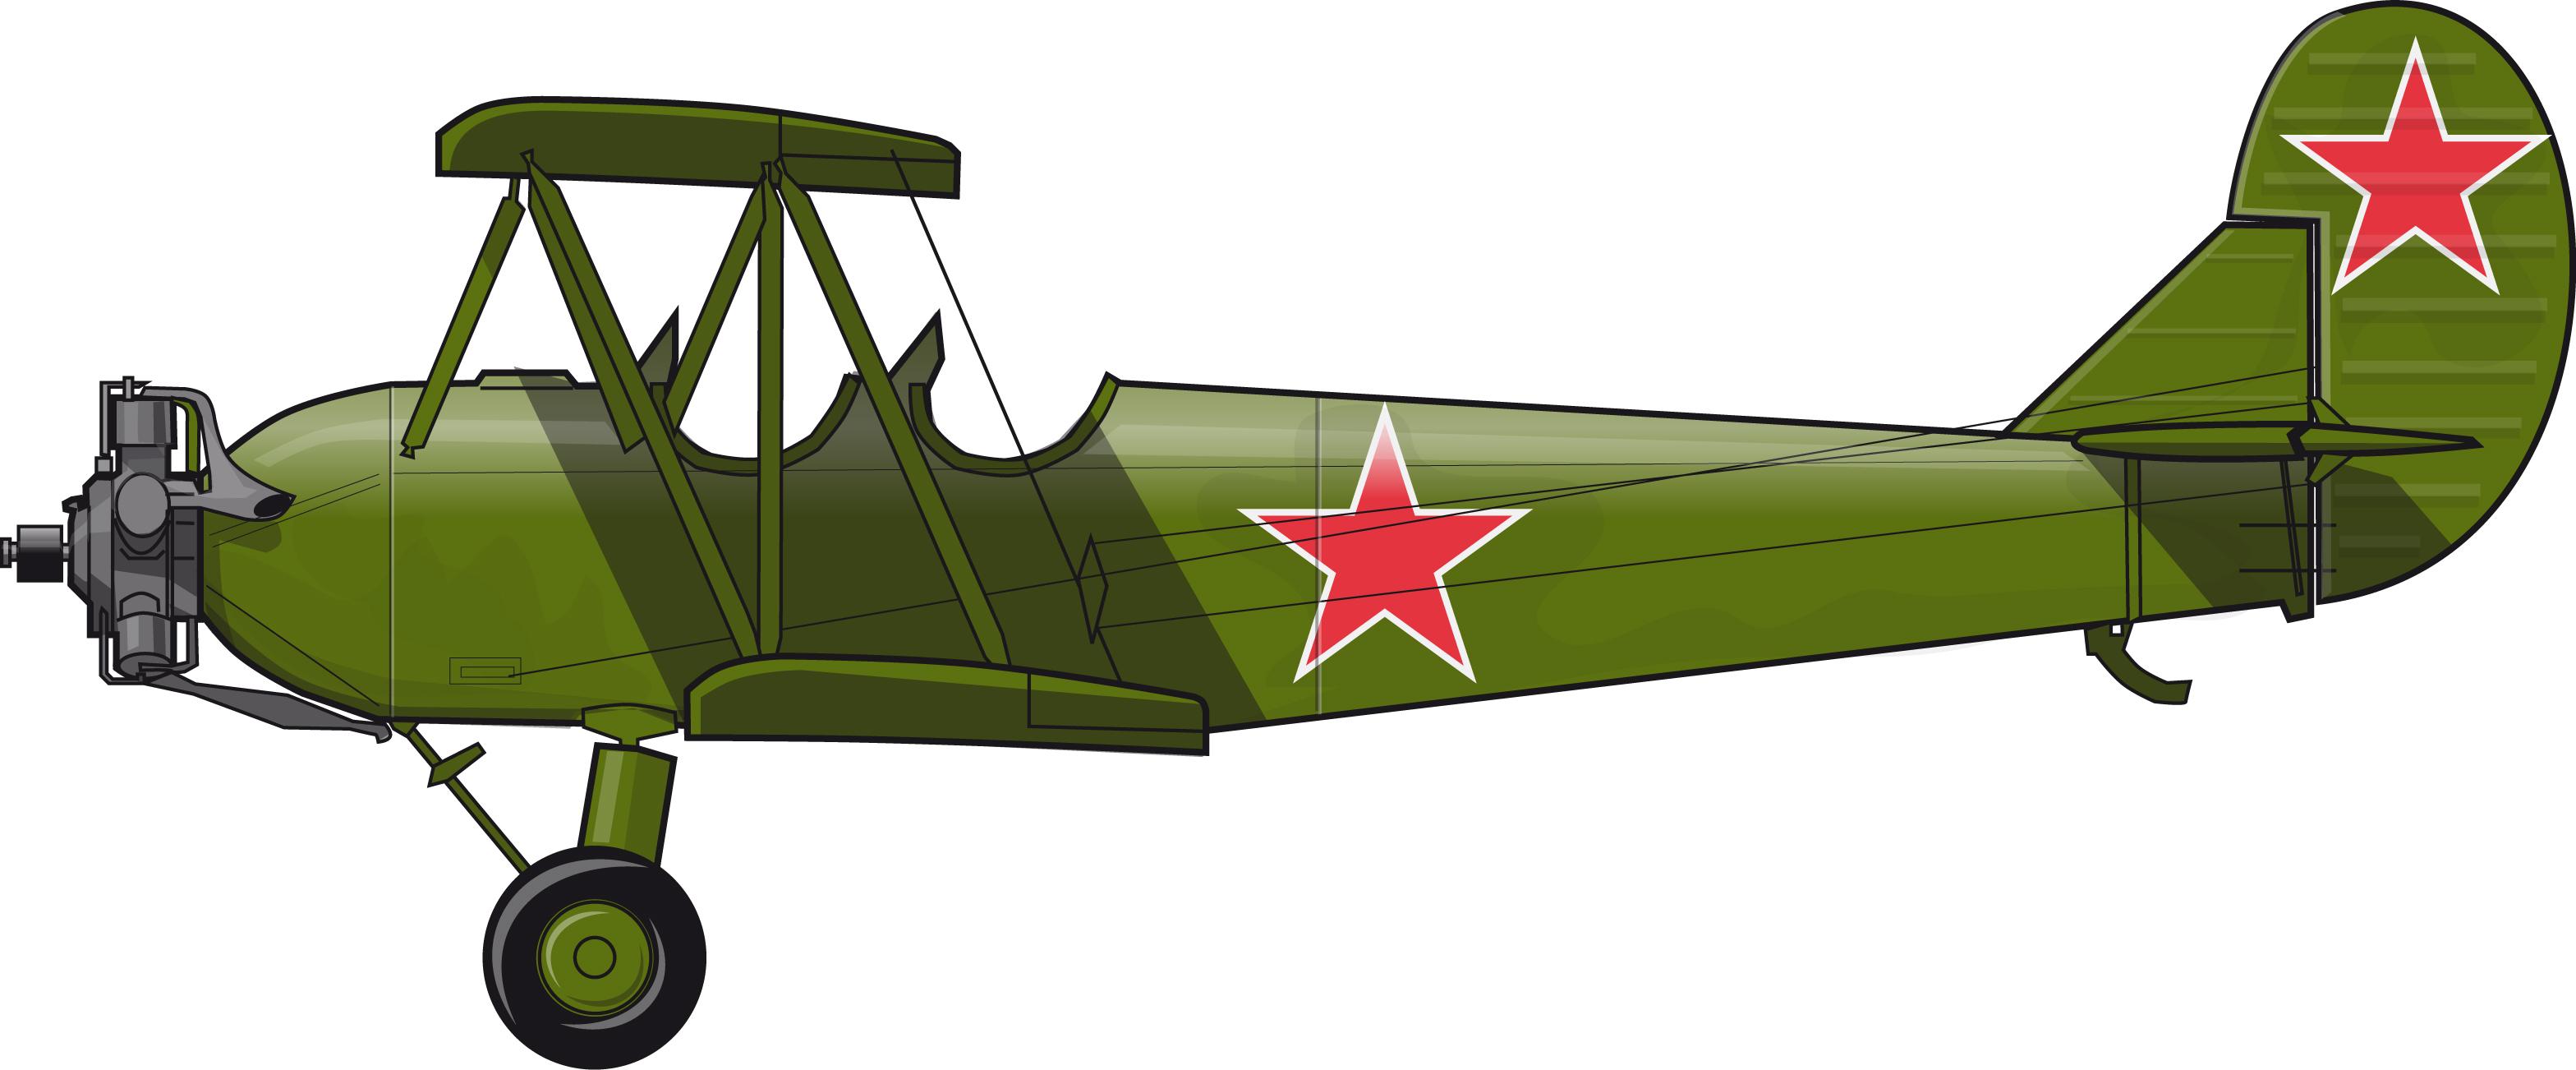 polikarpovu21937